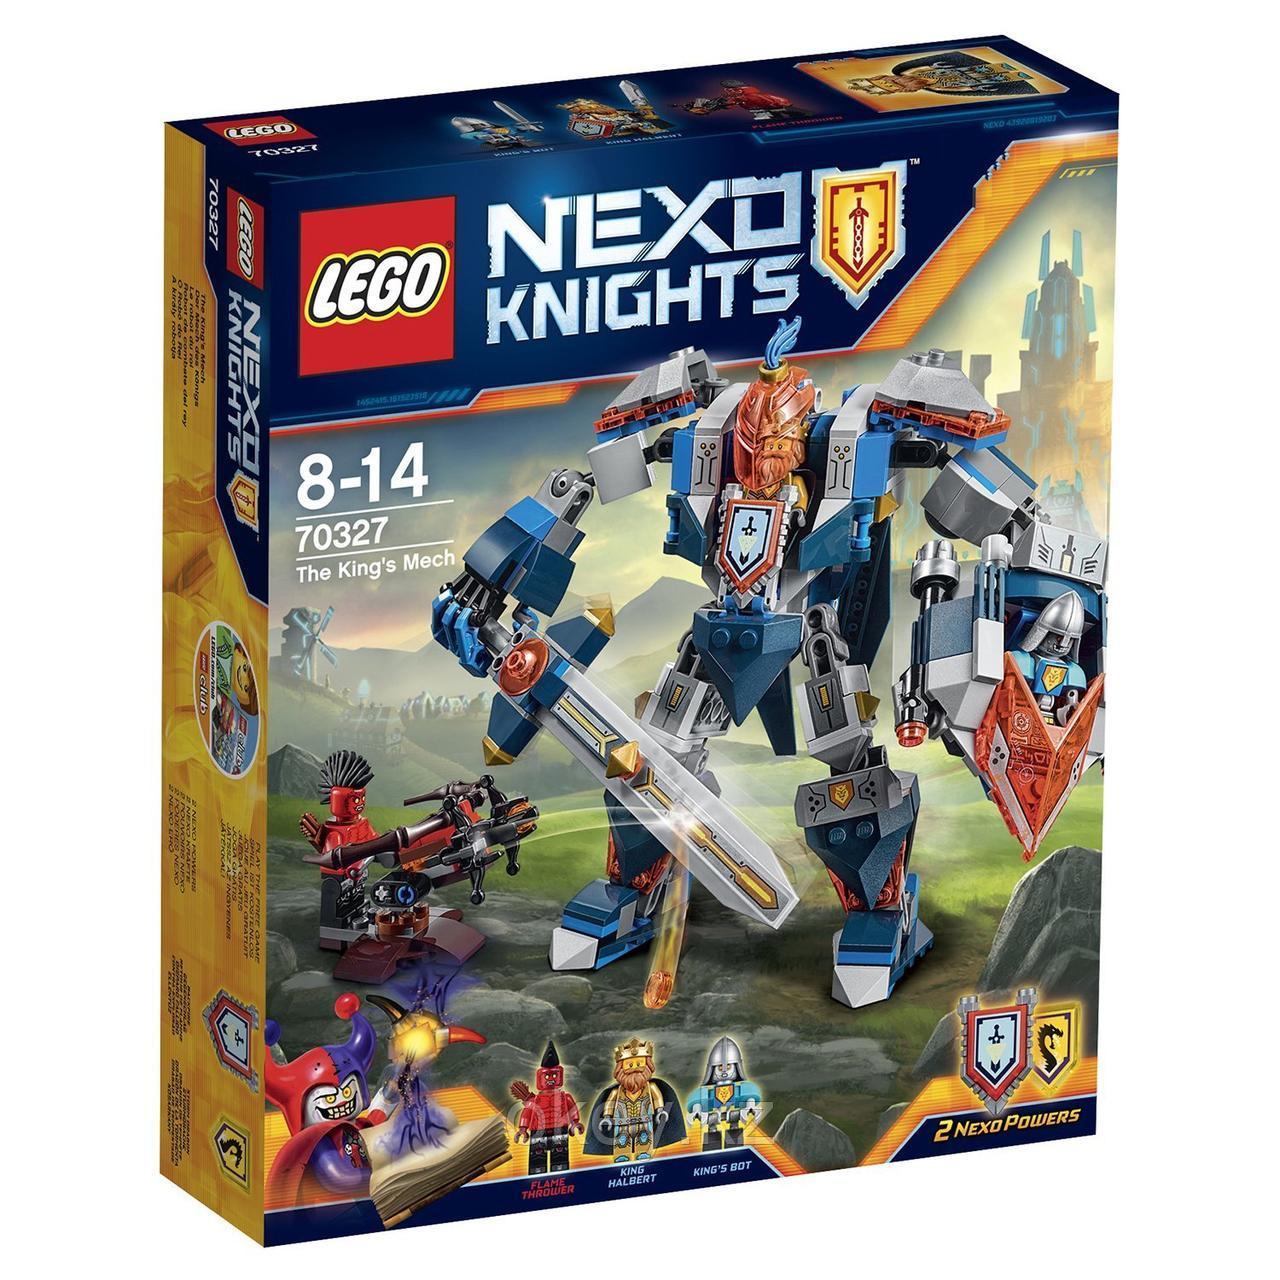 LEGO Nexo Knights: Механический рыцарь Короля aka Королевские доспехи 70327